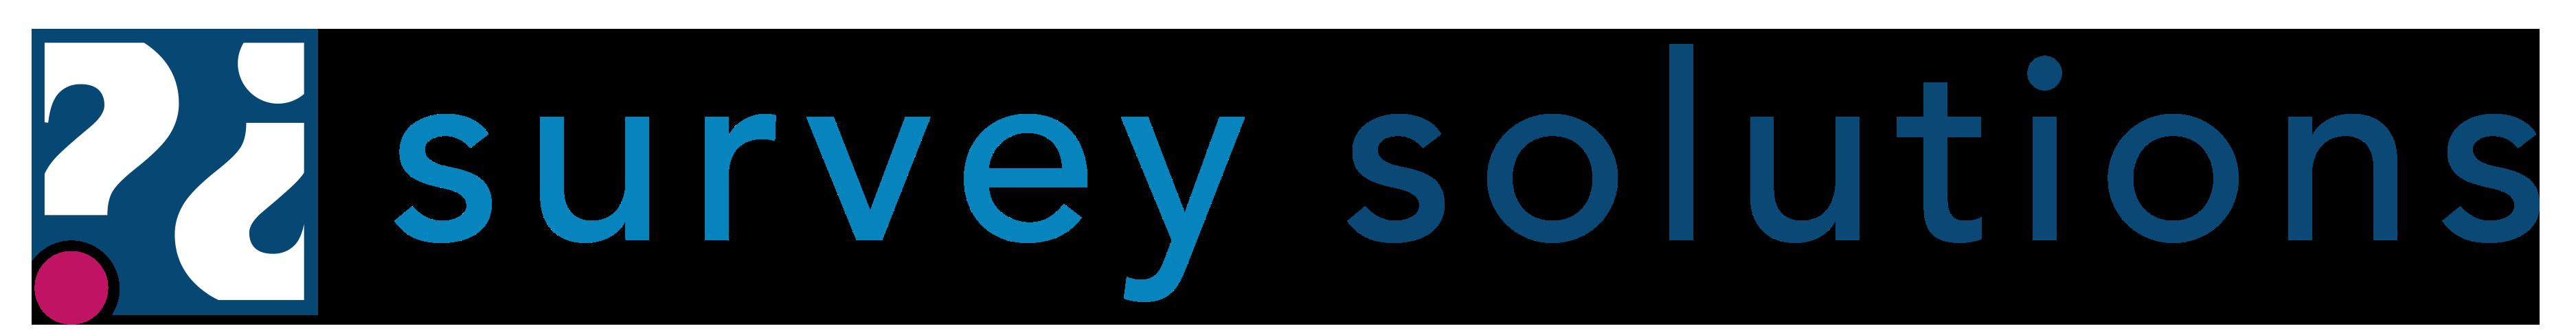 Survey Solutions Ltd. Company Logo